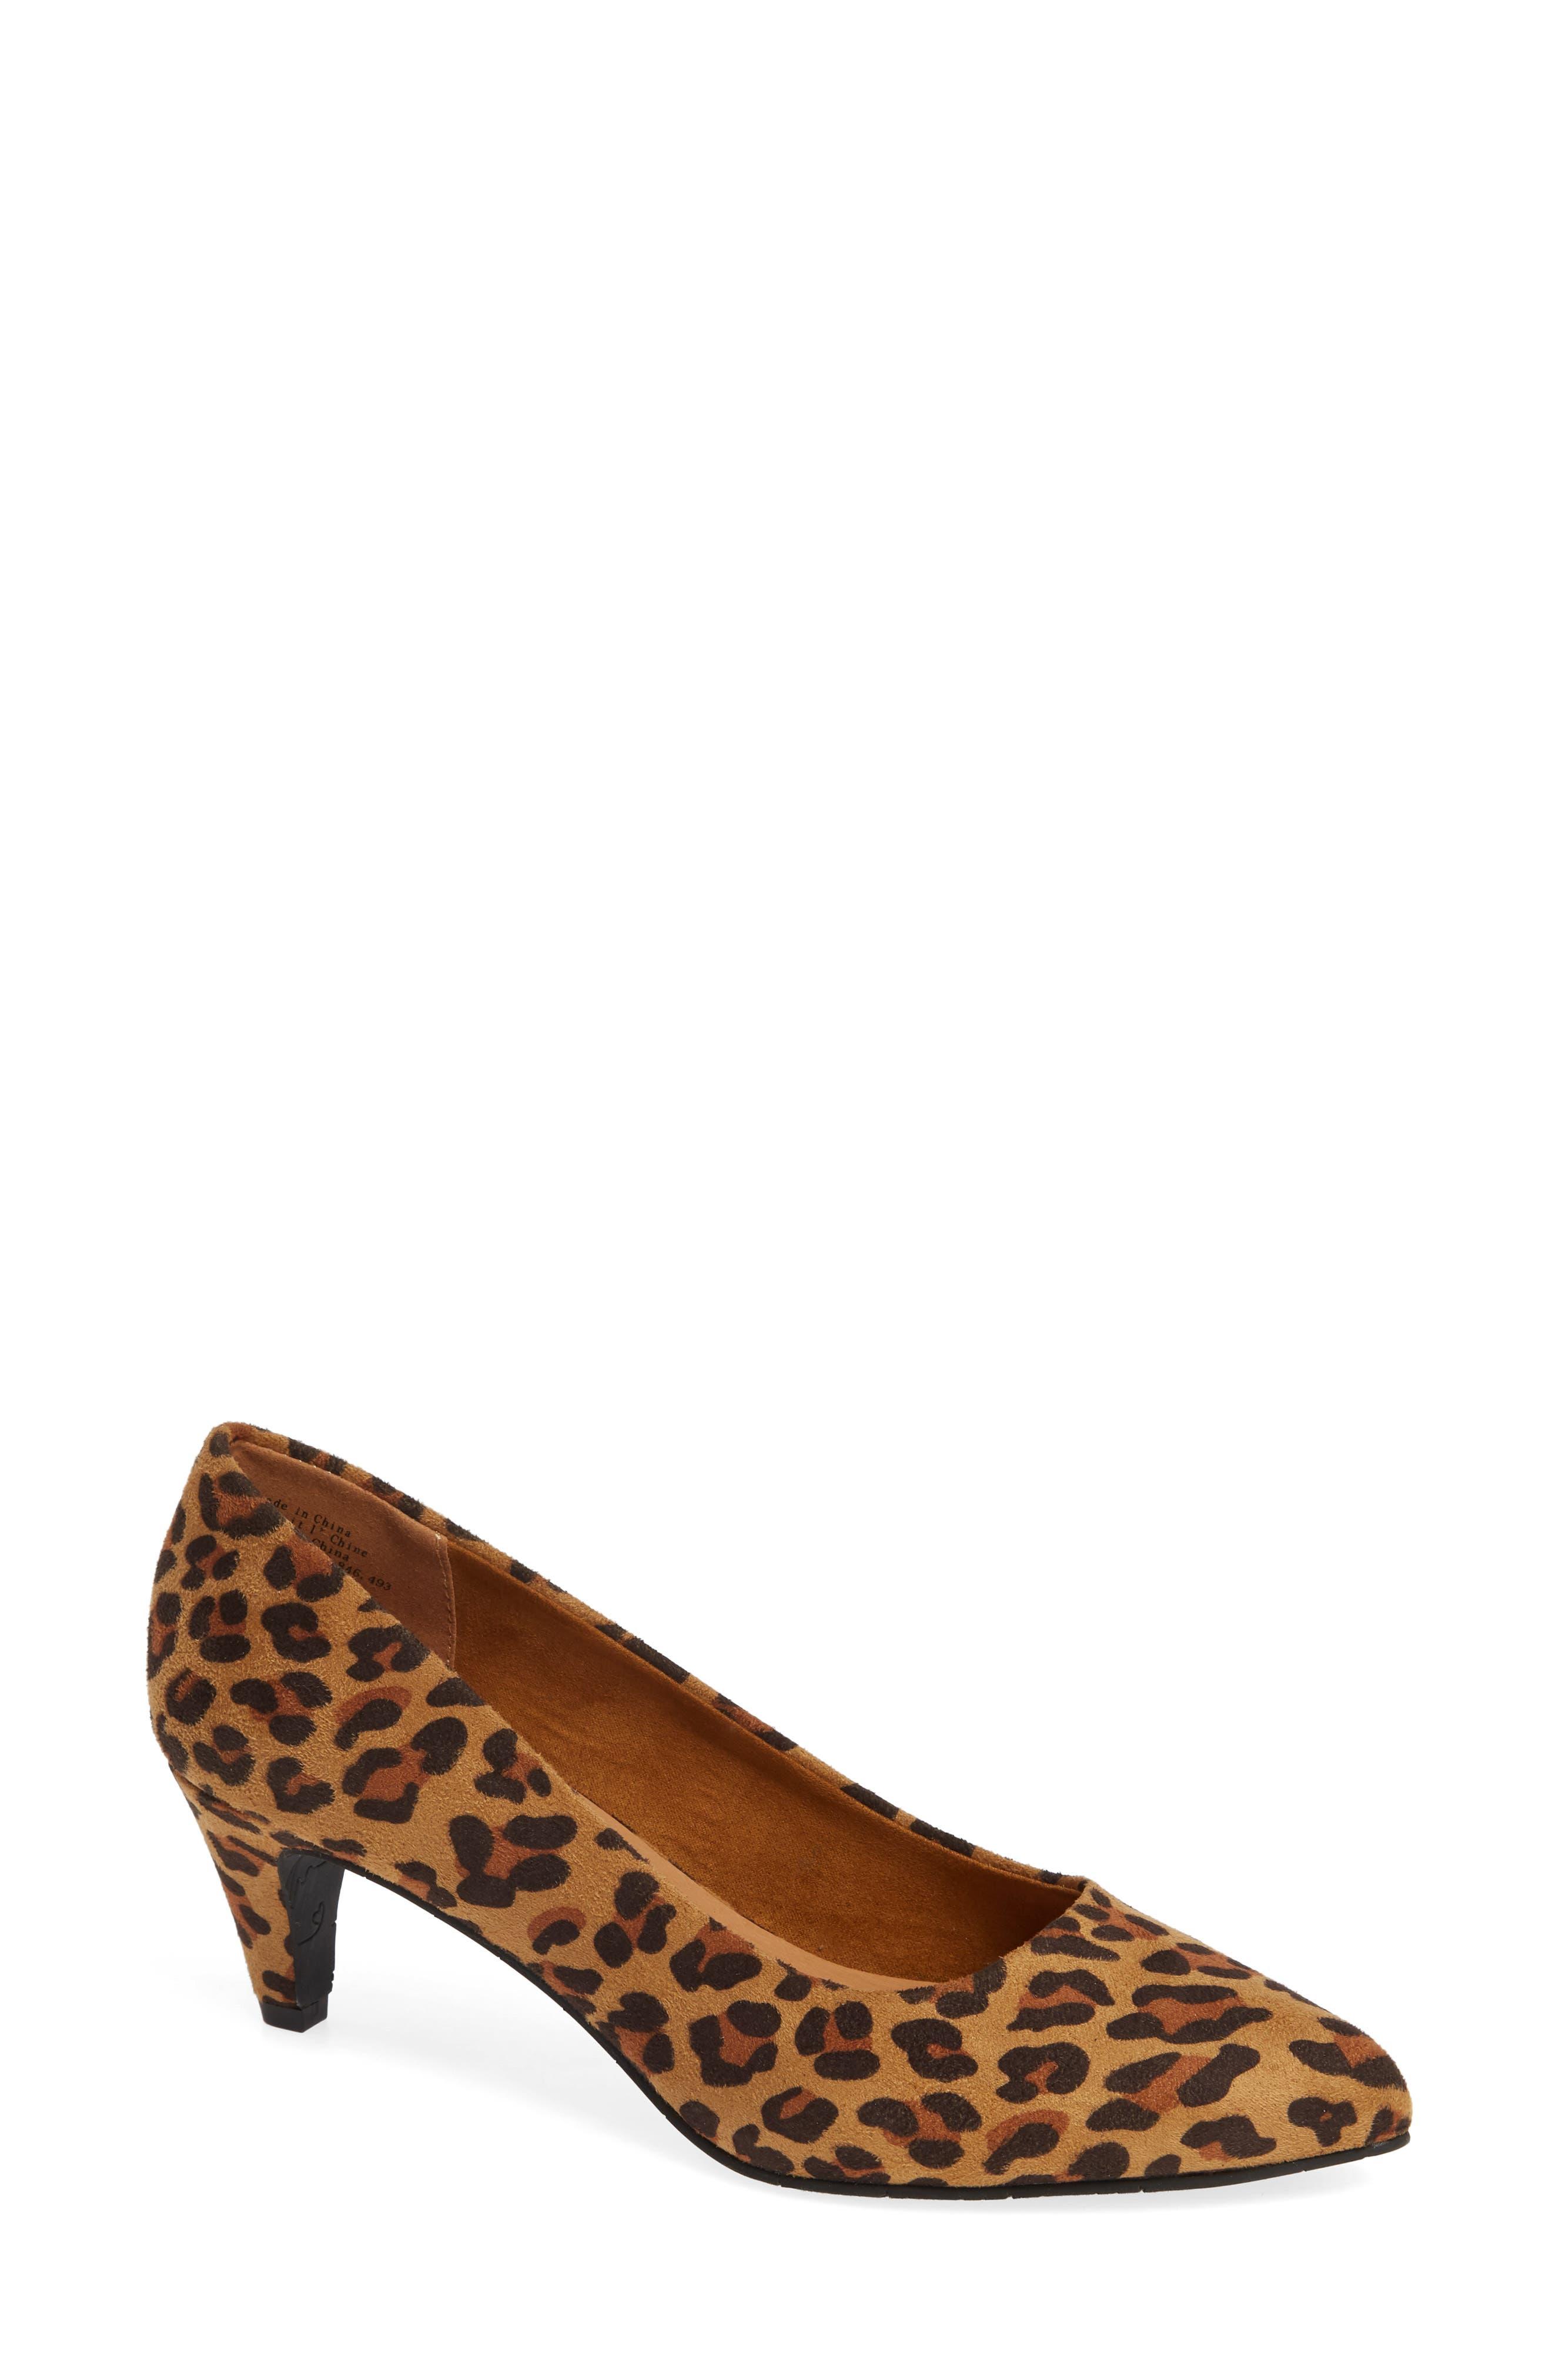 Bc Footwear Karat Kitten Heel Pump, Brown